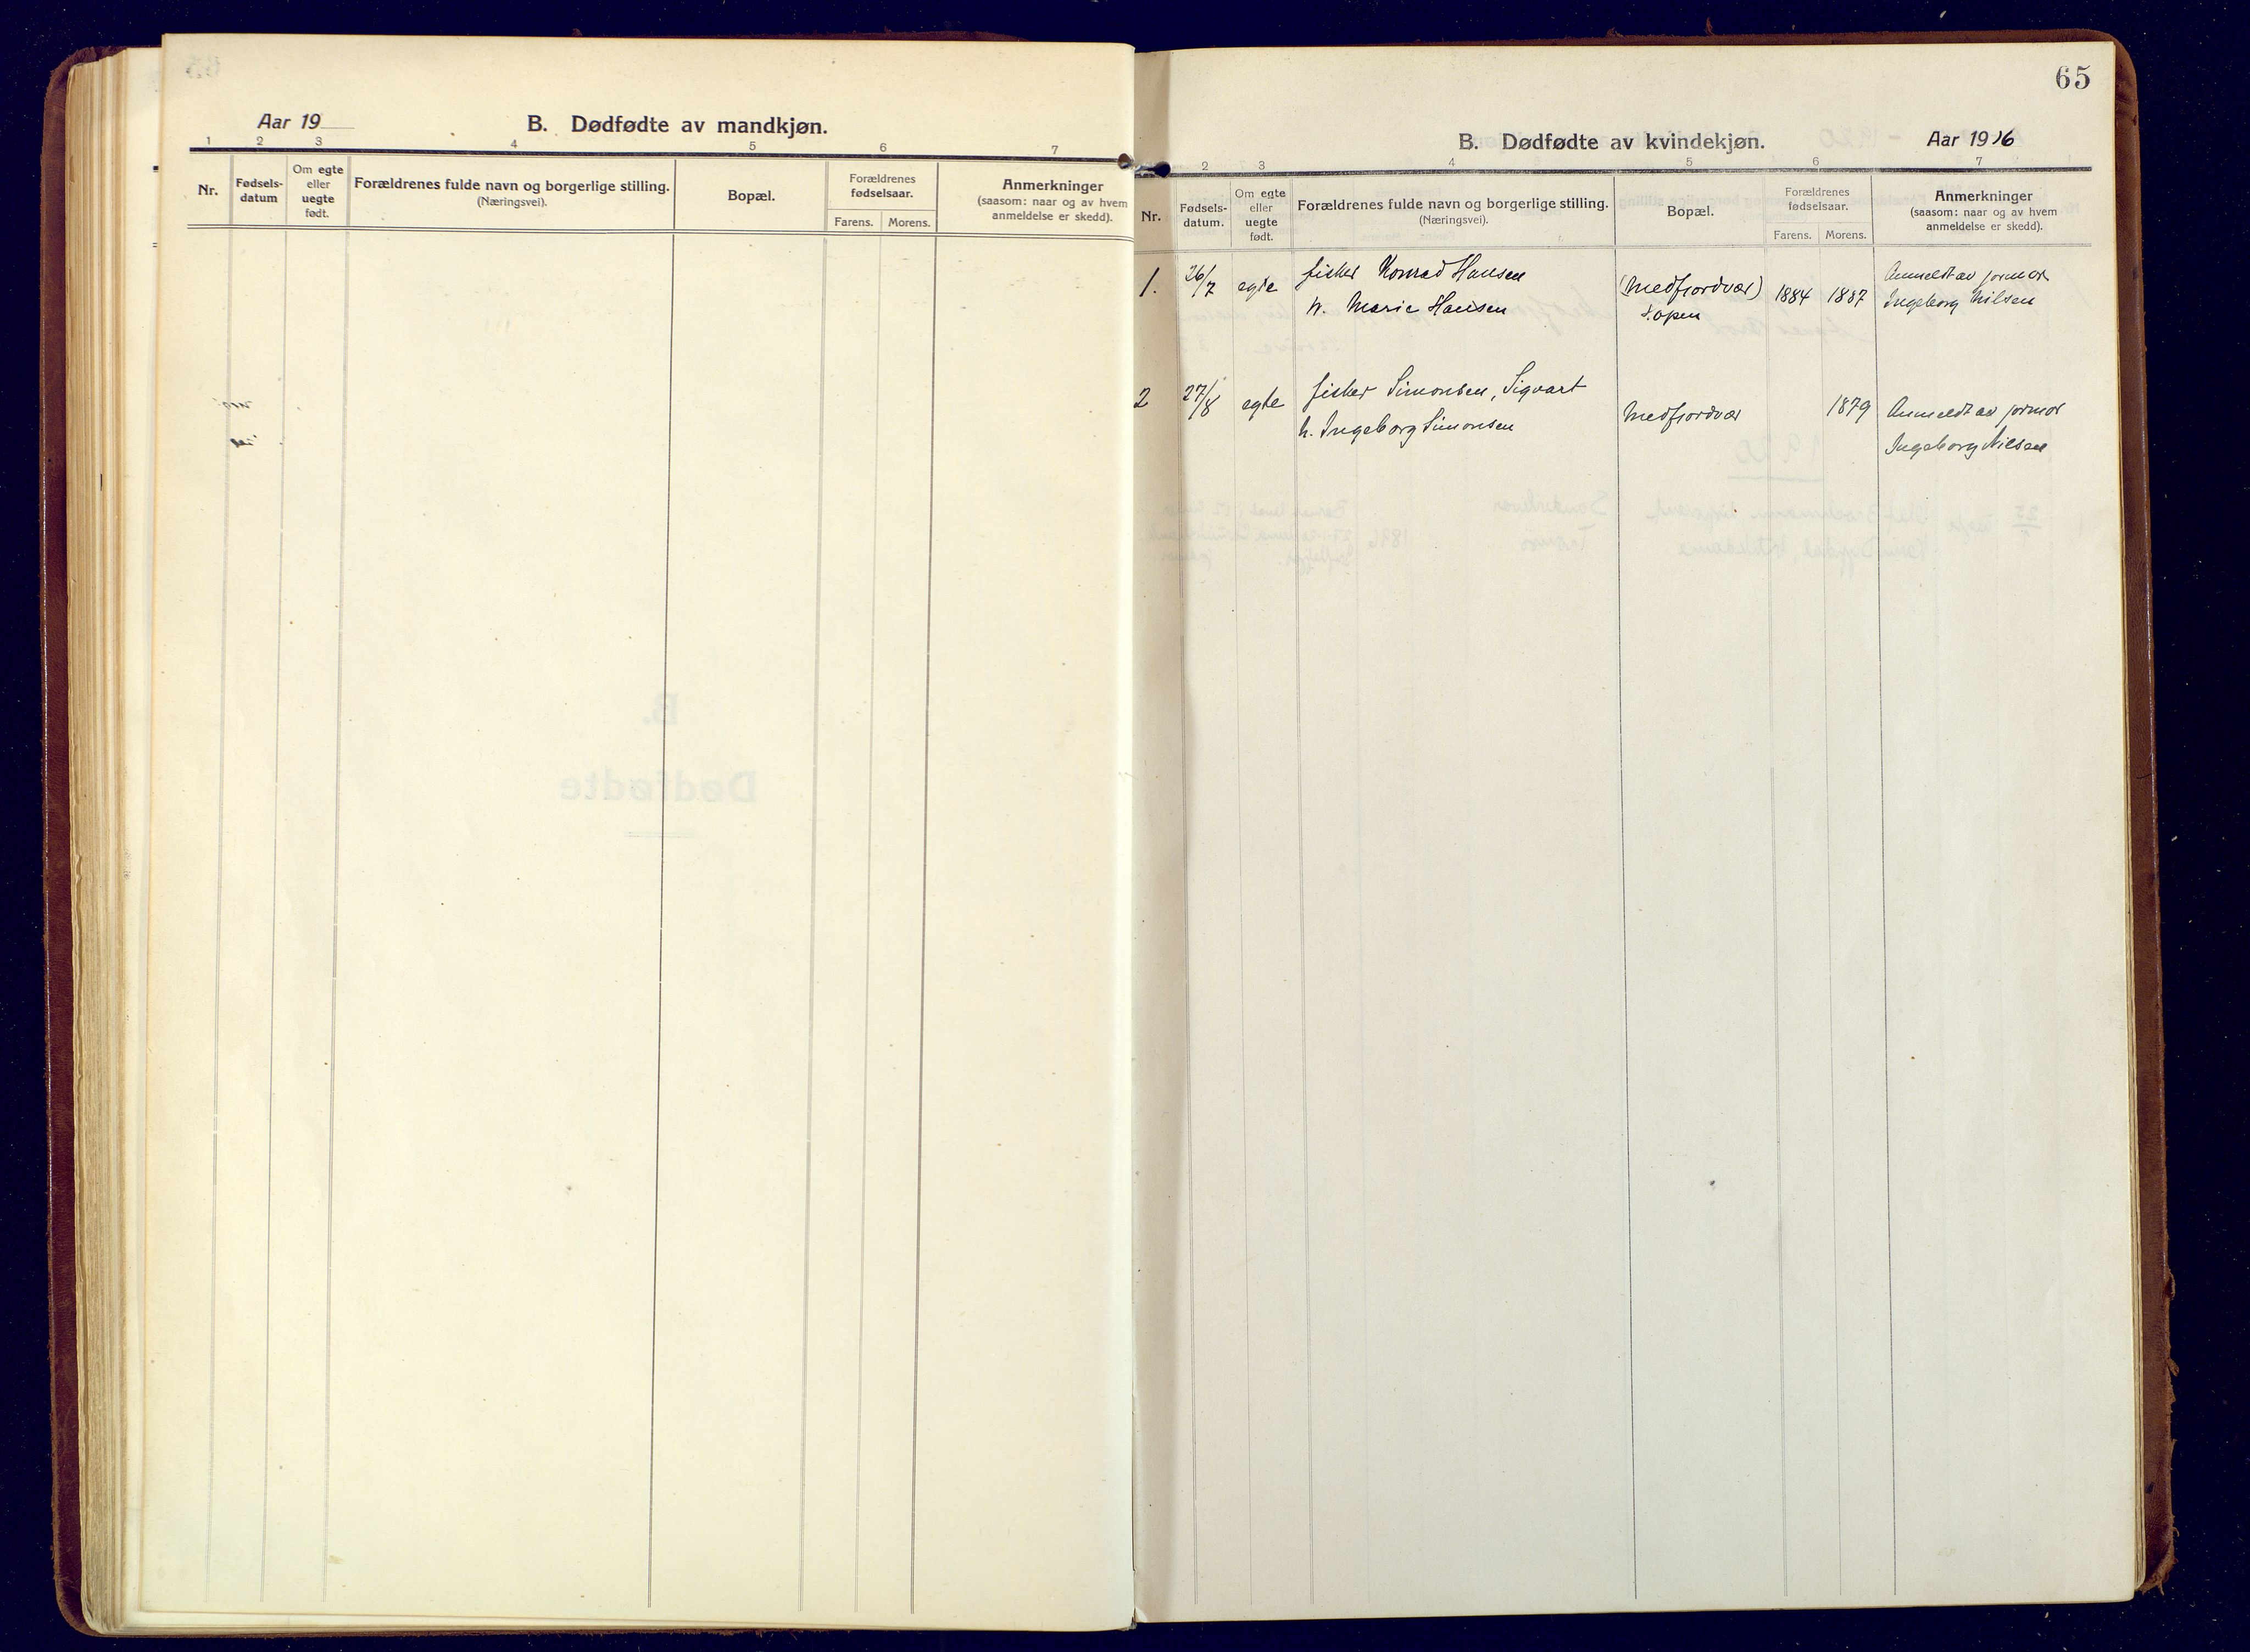 SATØ, Mefjord/Berg sokneprestkontor, G/Ga/Gaa: Ministerialbok nr. 9, 1916-1928, s. 65